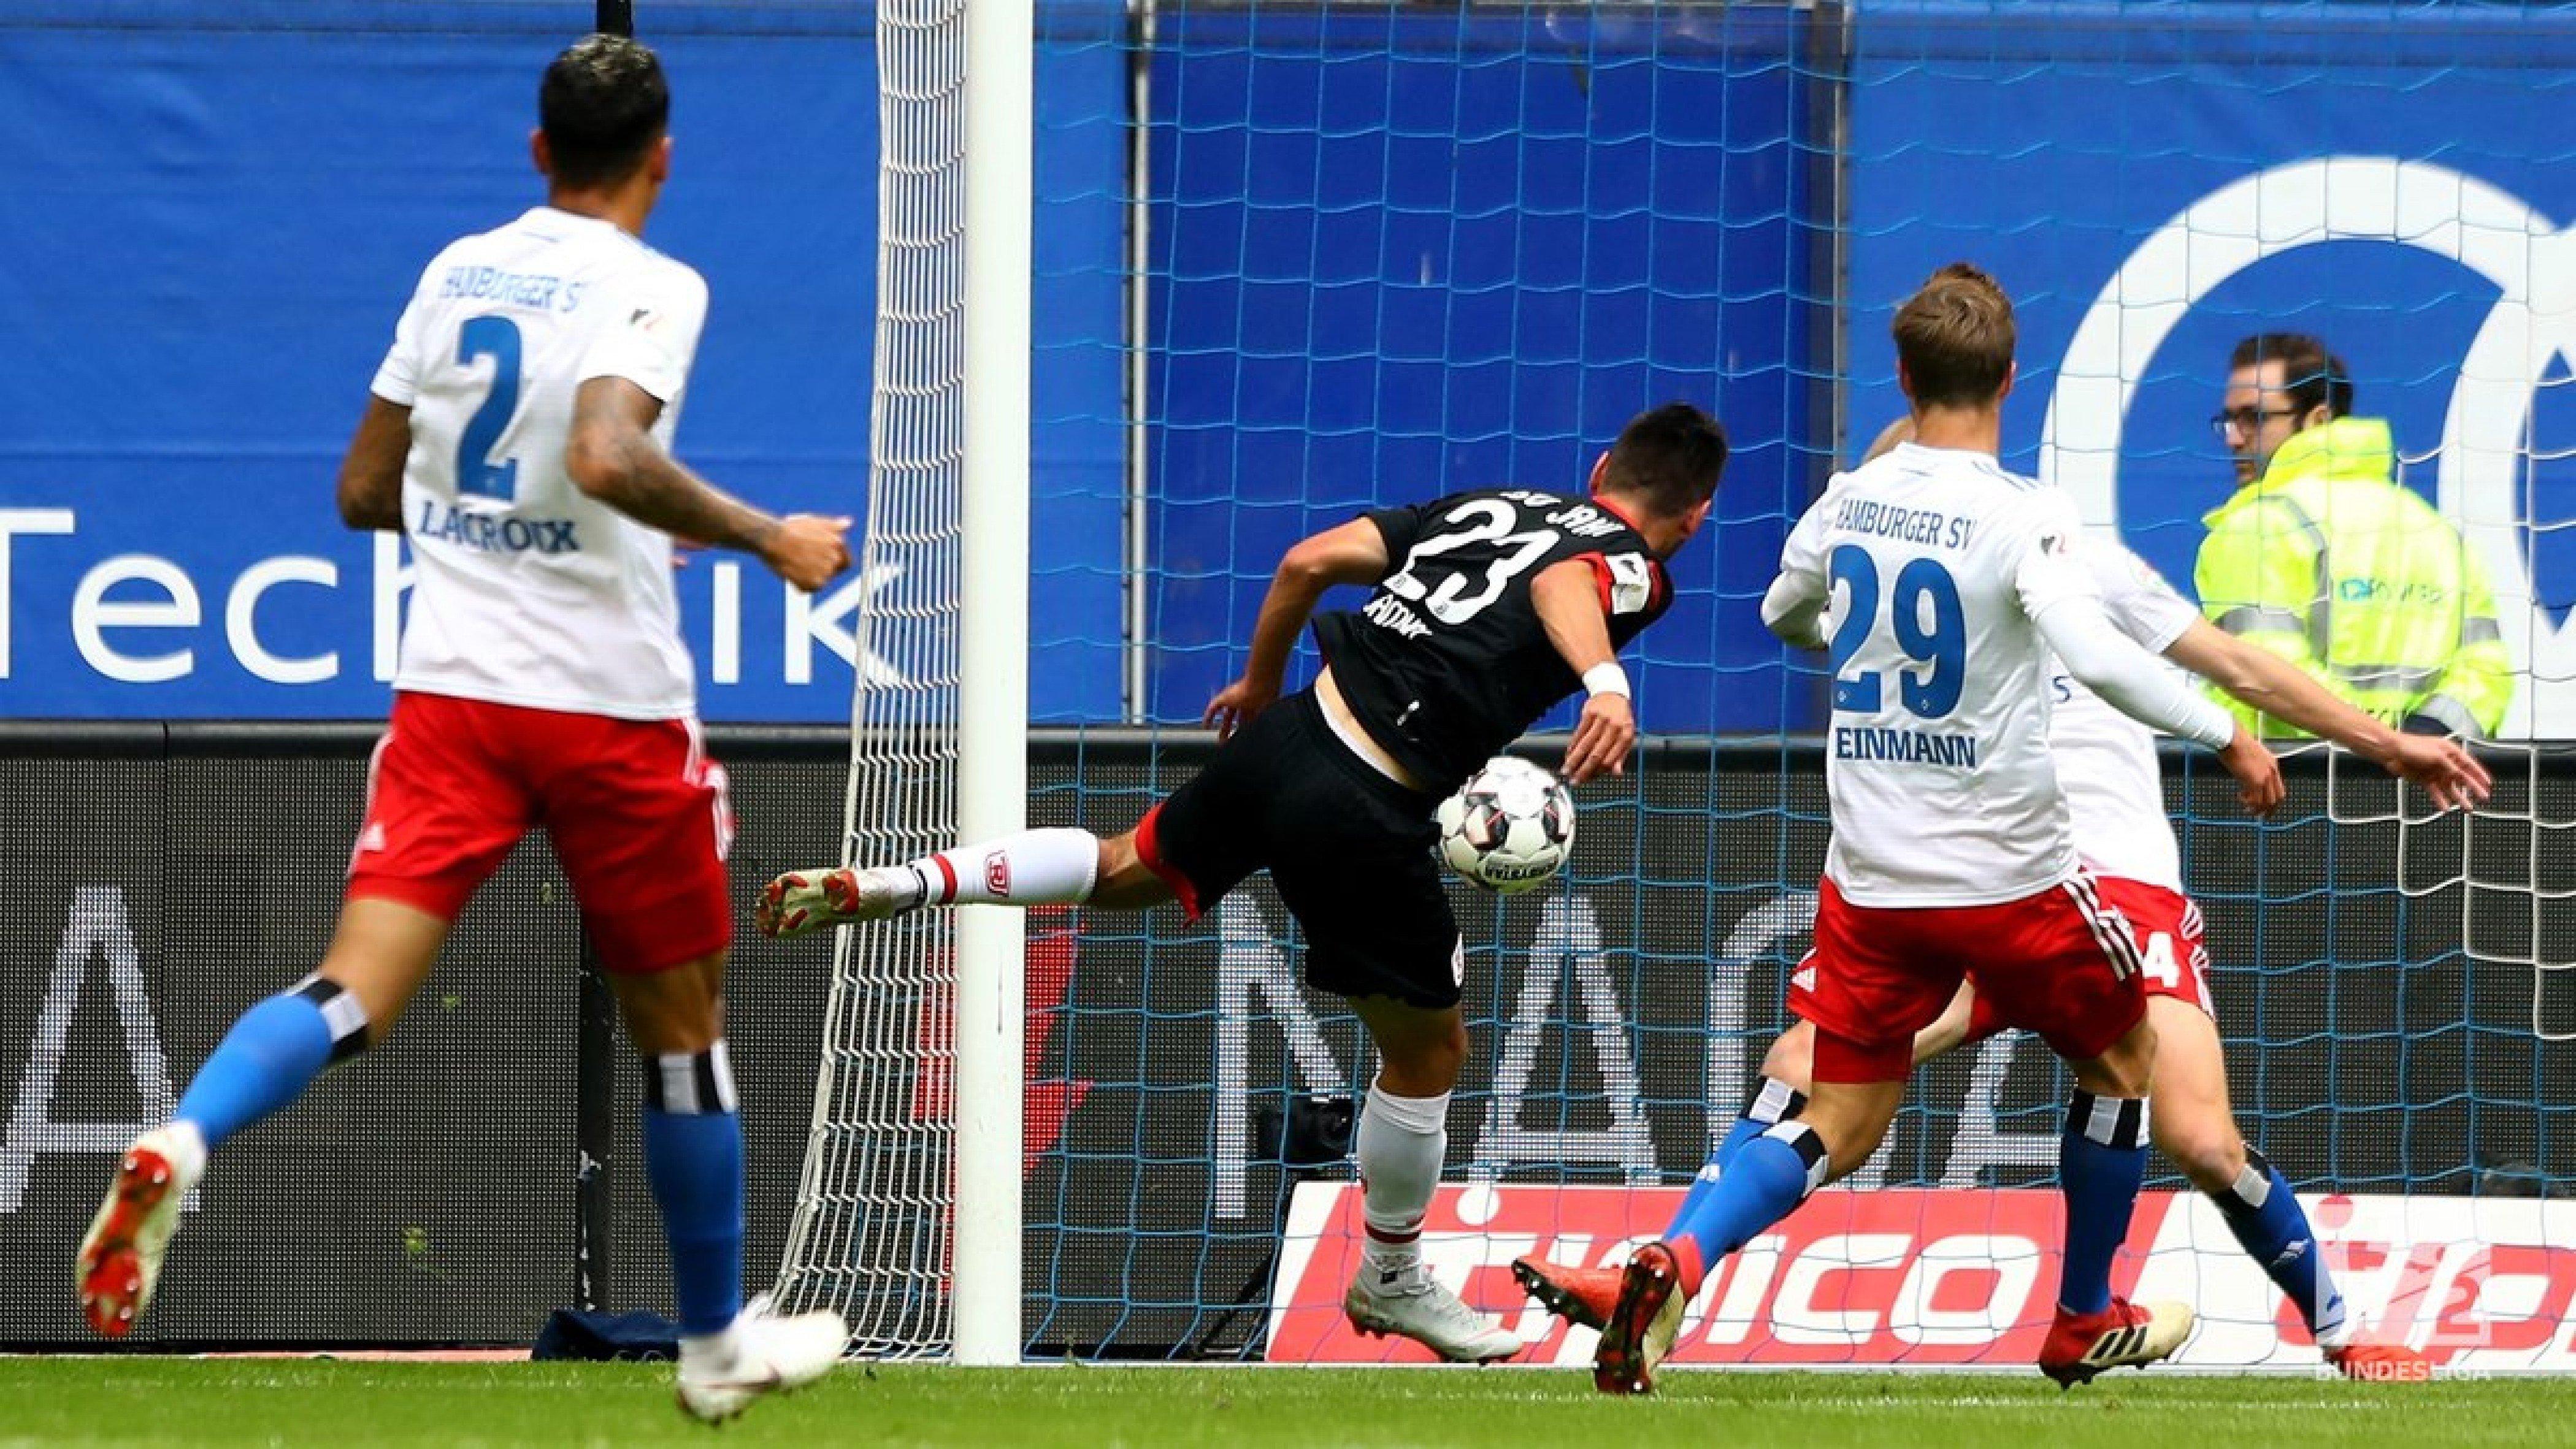 Hamburger SV 0-5 SSV Jahn Regensburg: Red Shorts capitulate in stunning fasion